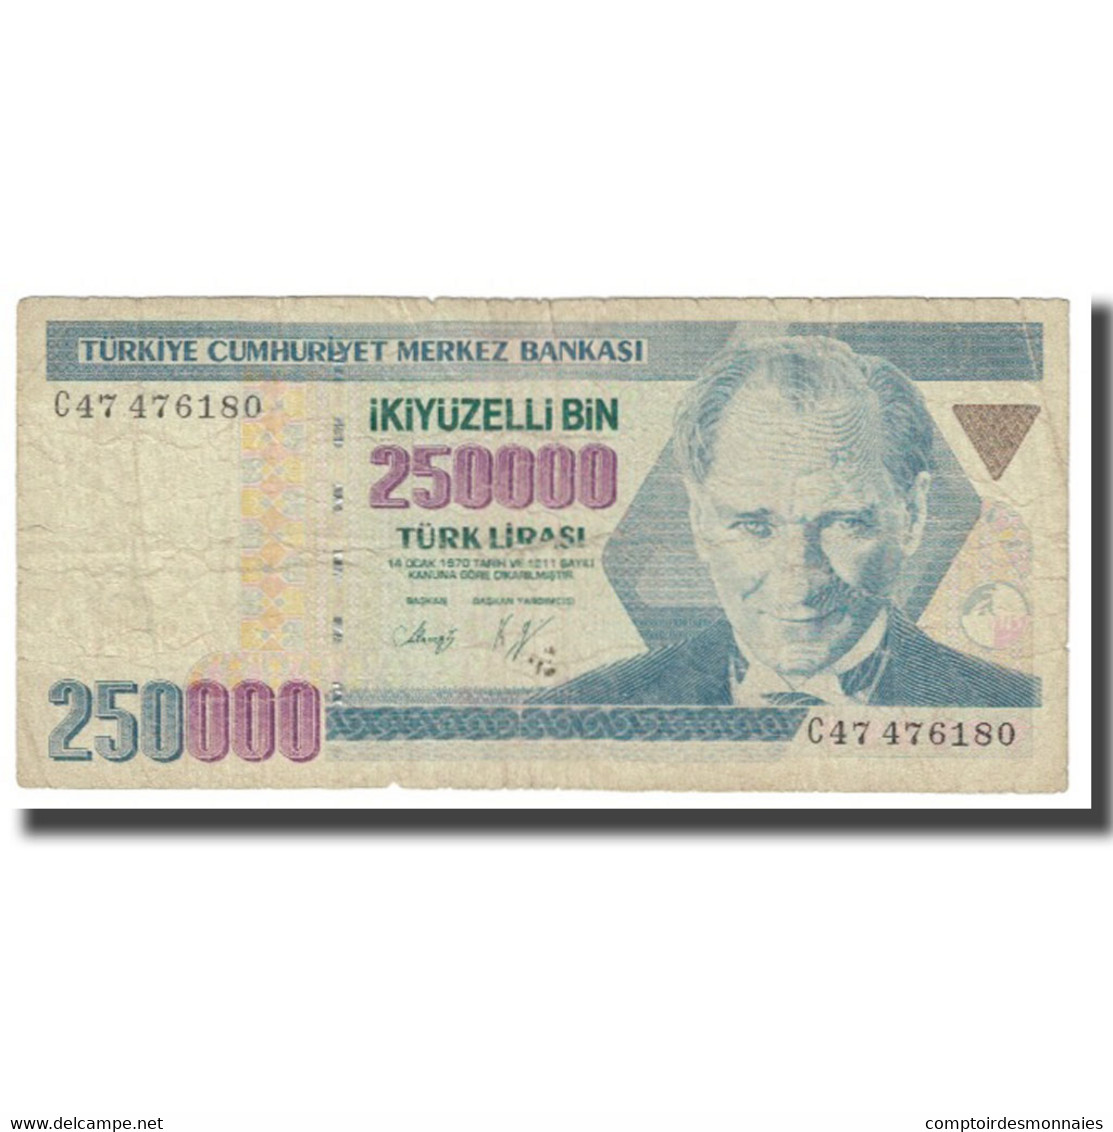 DISCOVERY OF AMERICA SPAIN 5000 PESETAS 1991 6RW 26 JUL SILVER COIN